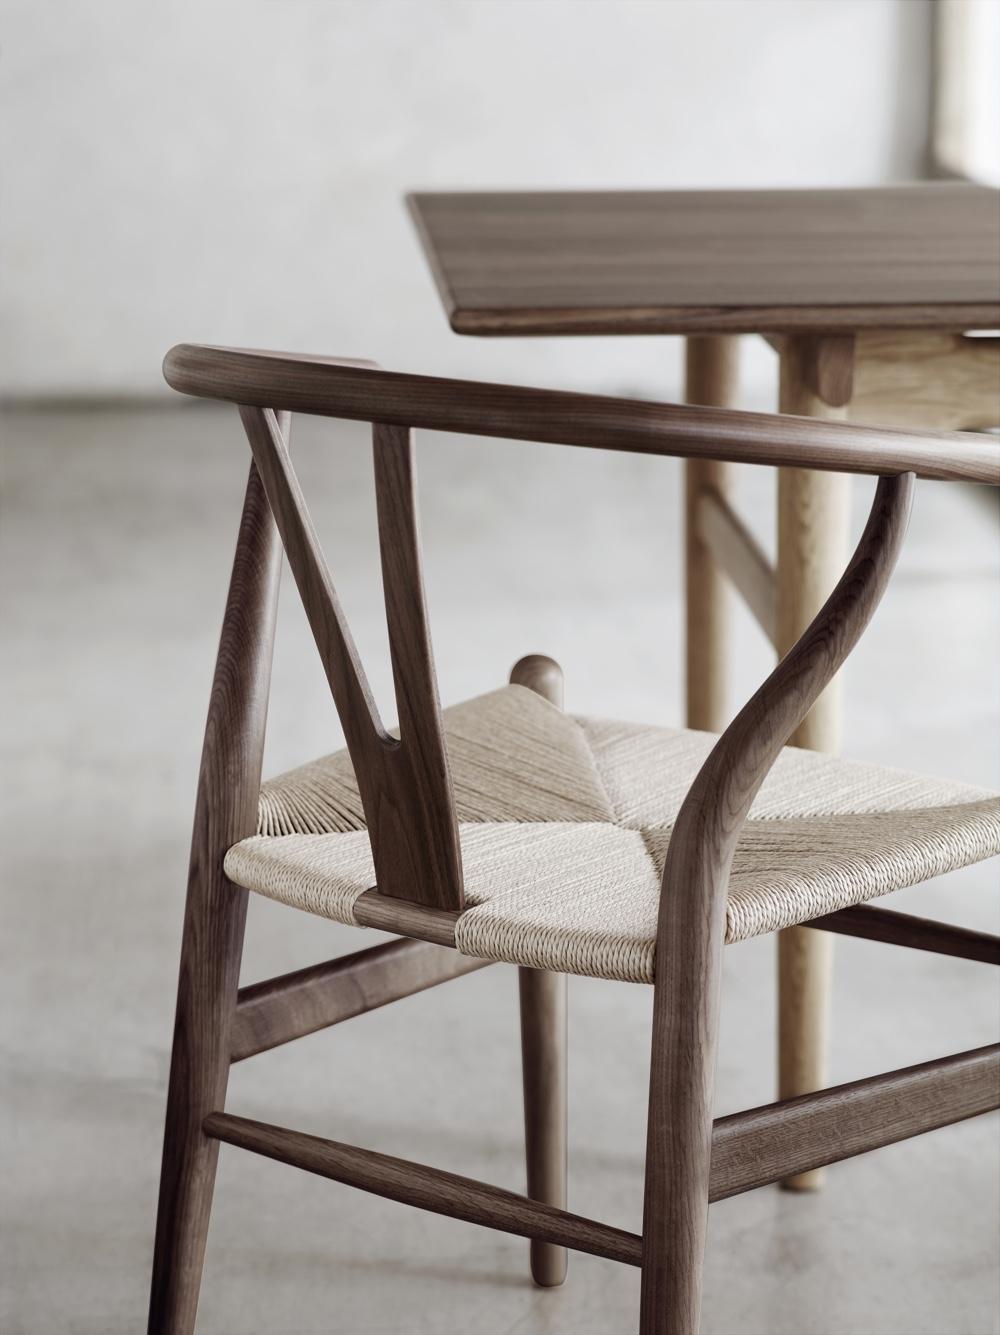 Wishbone Chair detail. Image © Carl Hansen & Søn.